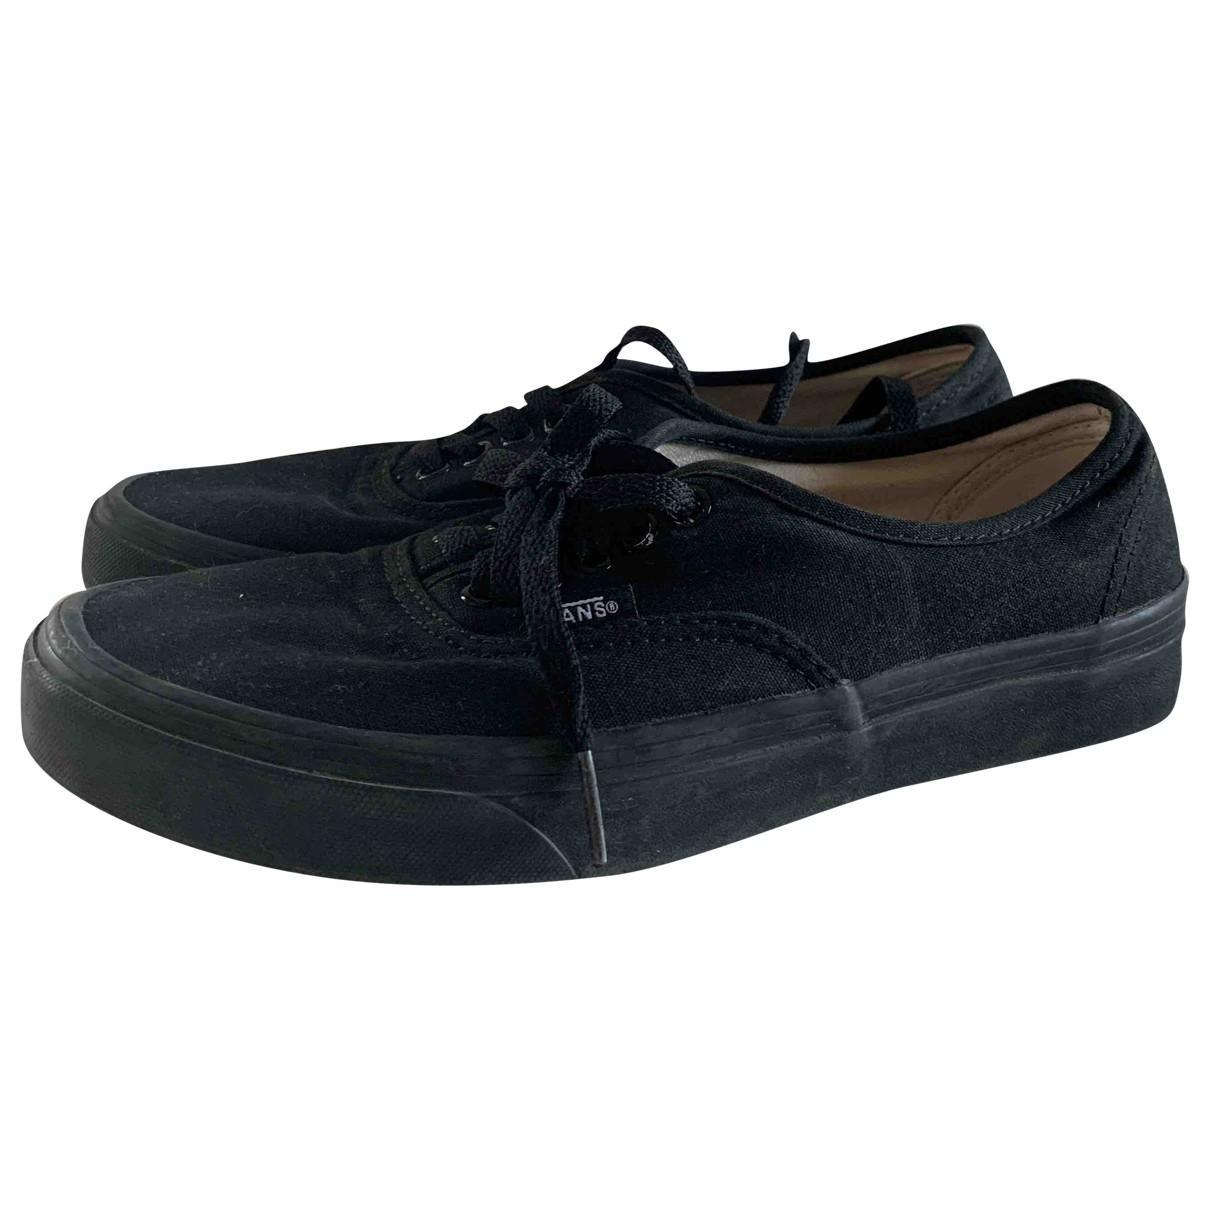 Vans \N Black Cloth Trainers for Women 38.5 EU